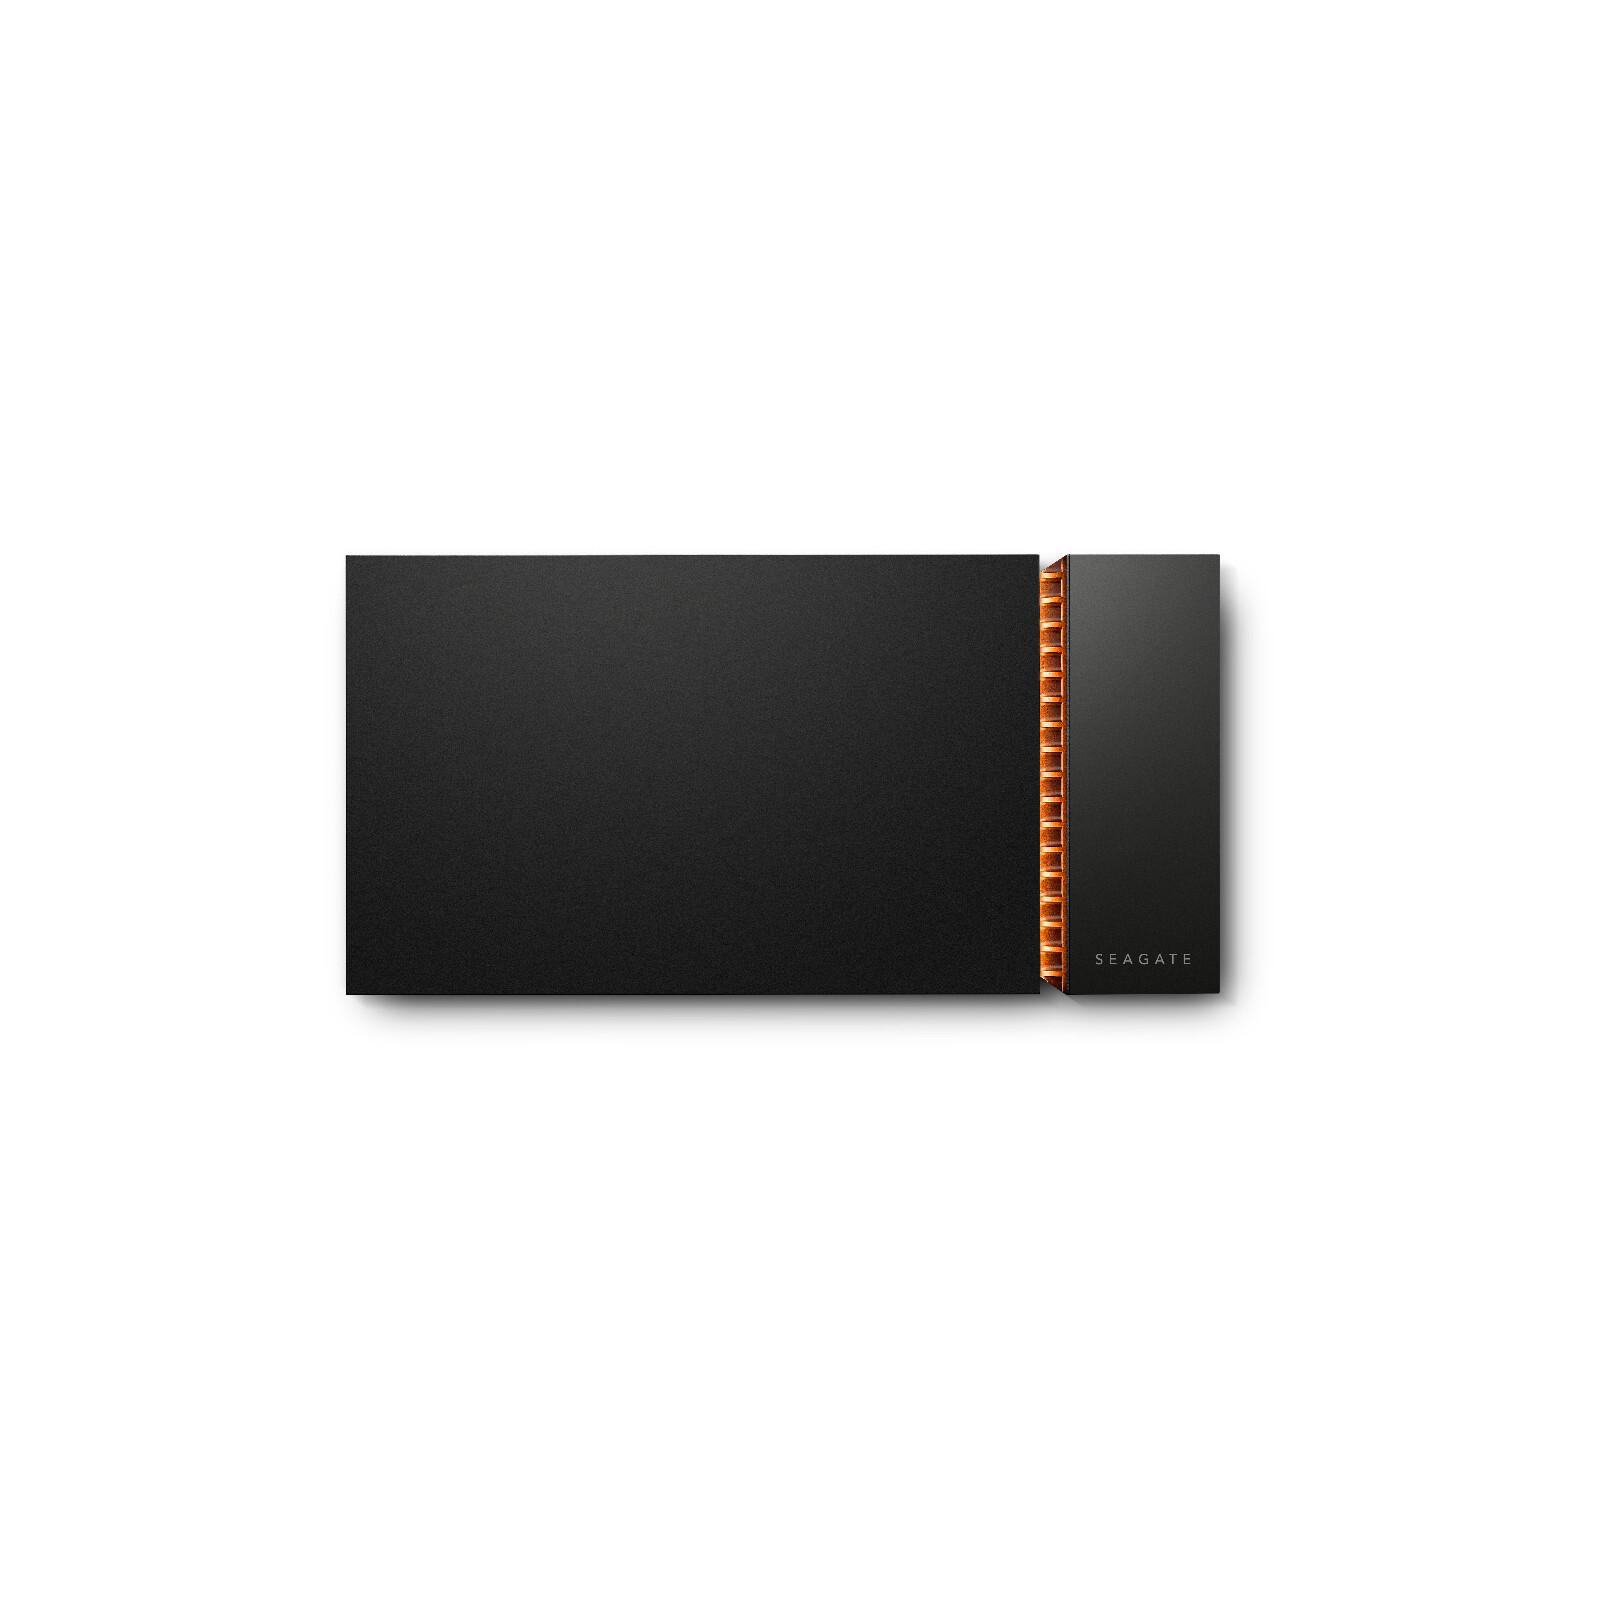 Seagate FireCuda Gaming Dock 4TB 3.5, Hub, RGB-LED, M.2